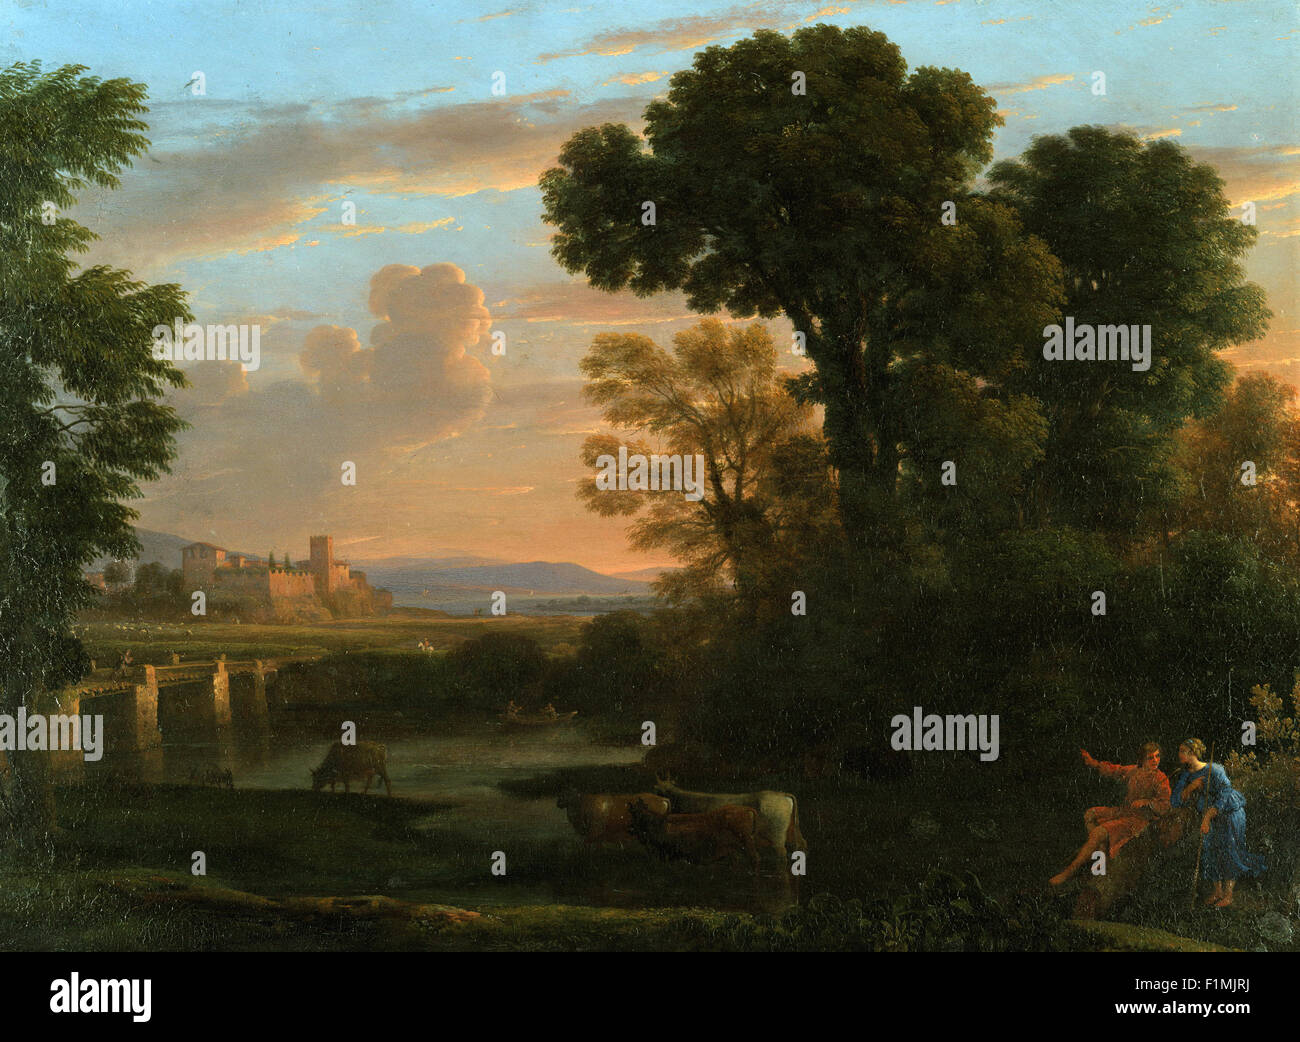 Claude Lorrain (Claude Gellée) - Pastoral Landscape - Stock Image